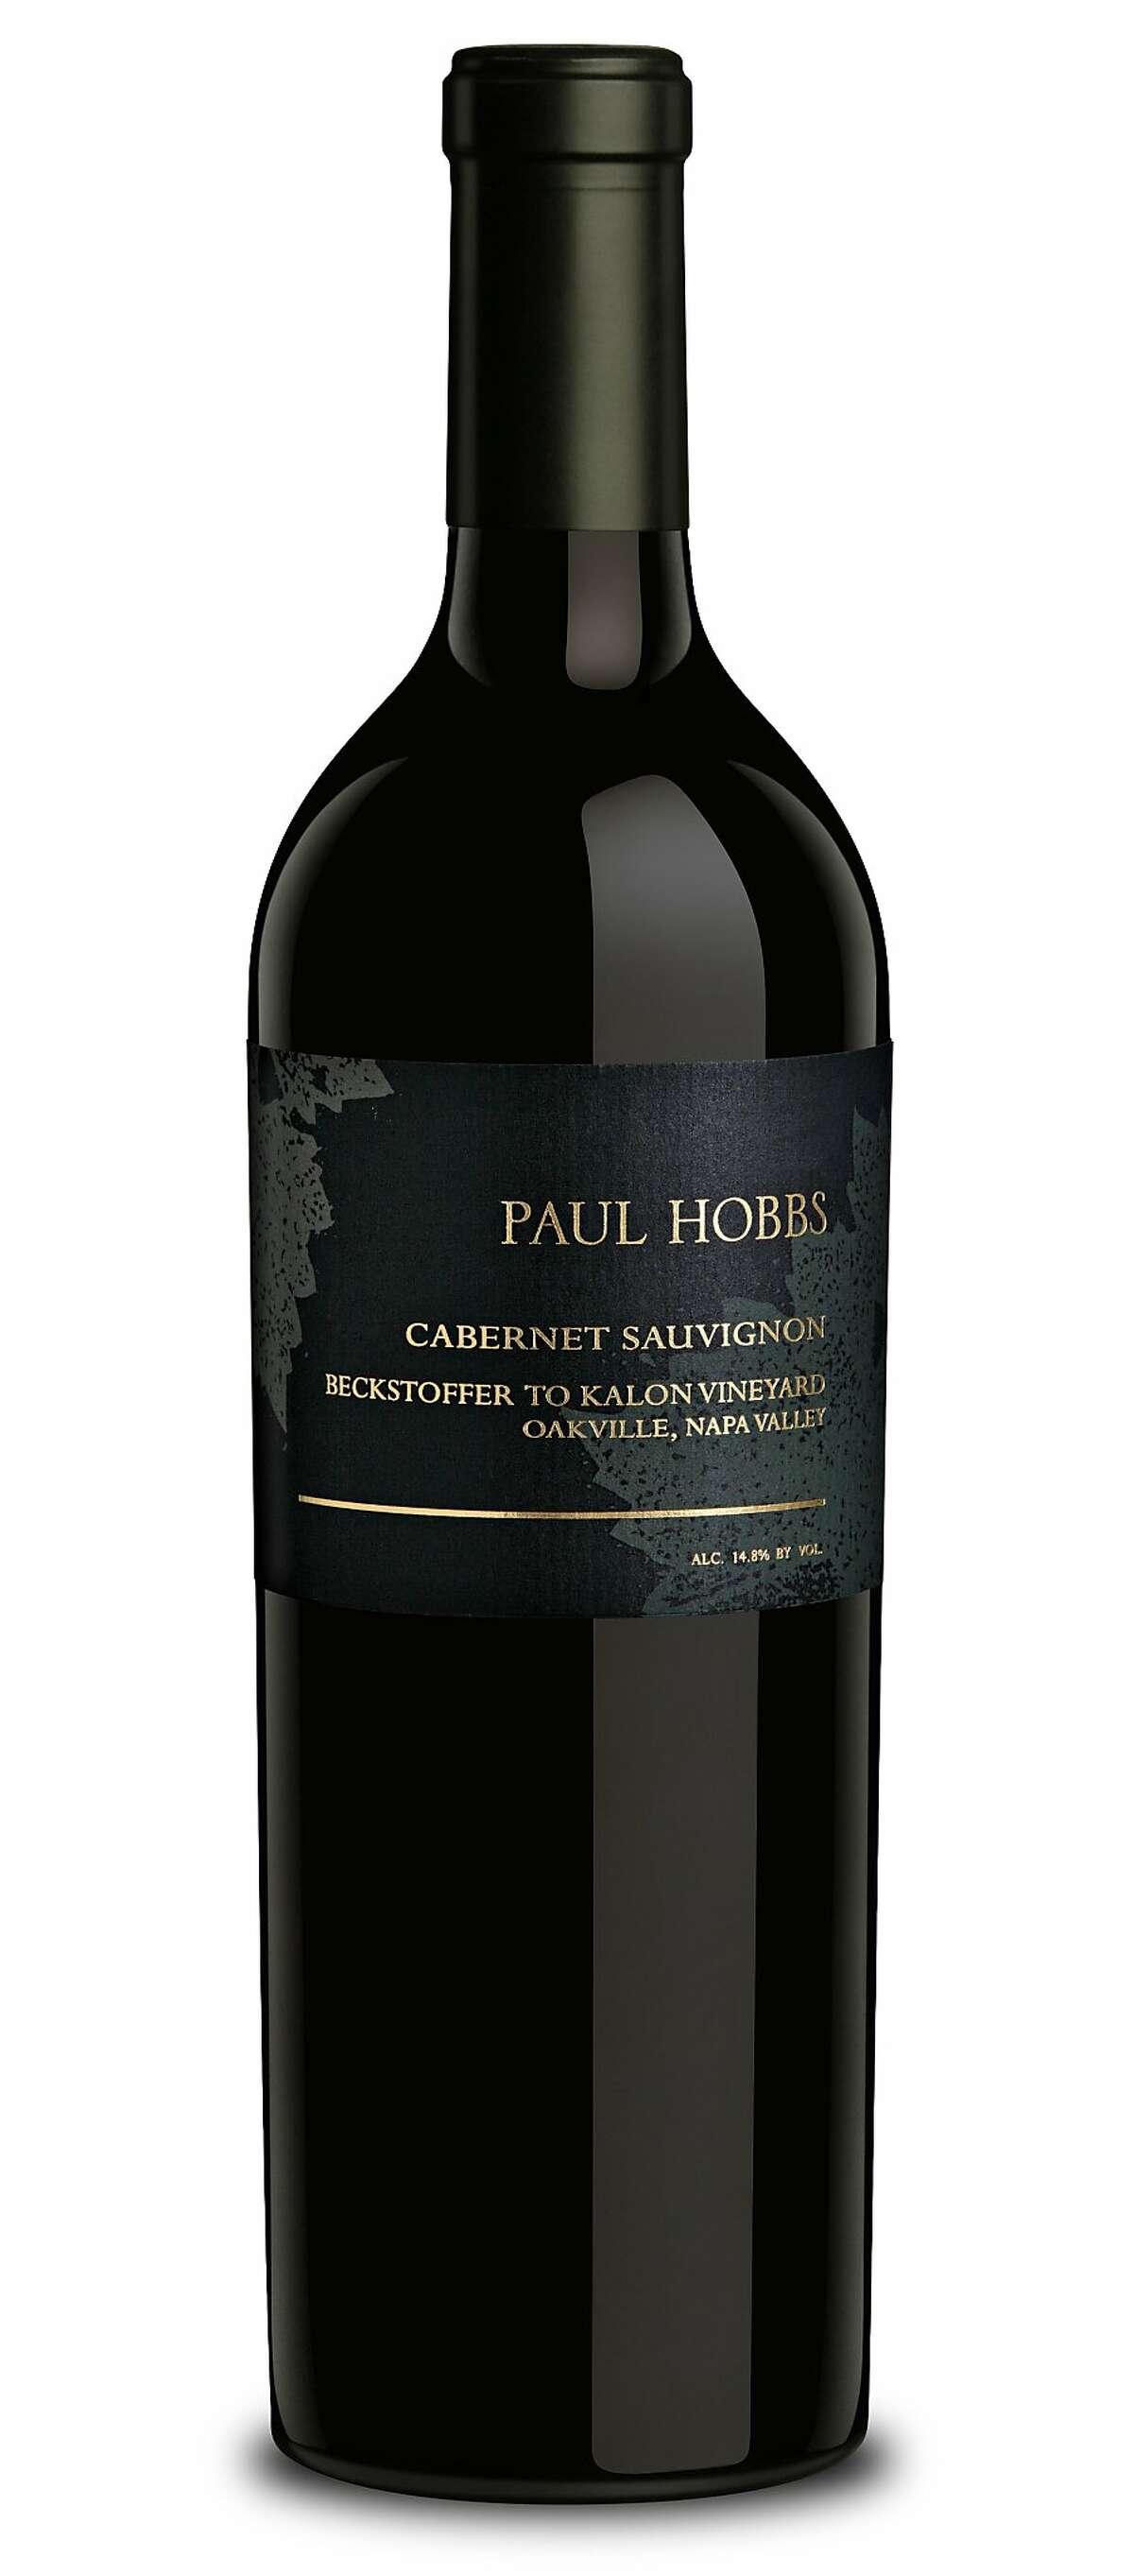 Paul Hobbs Cabernet Sauvignon Napa Valley Beckstoffer To Kalon Vineyard 2014 ($500, 14.9%)